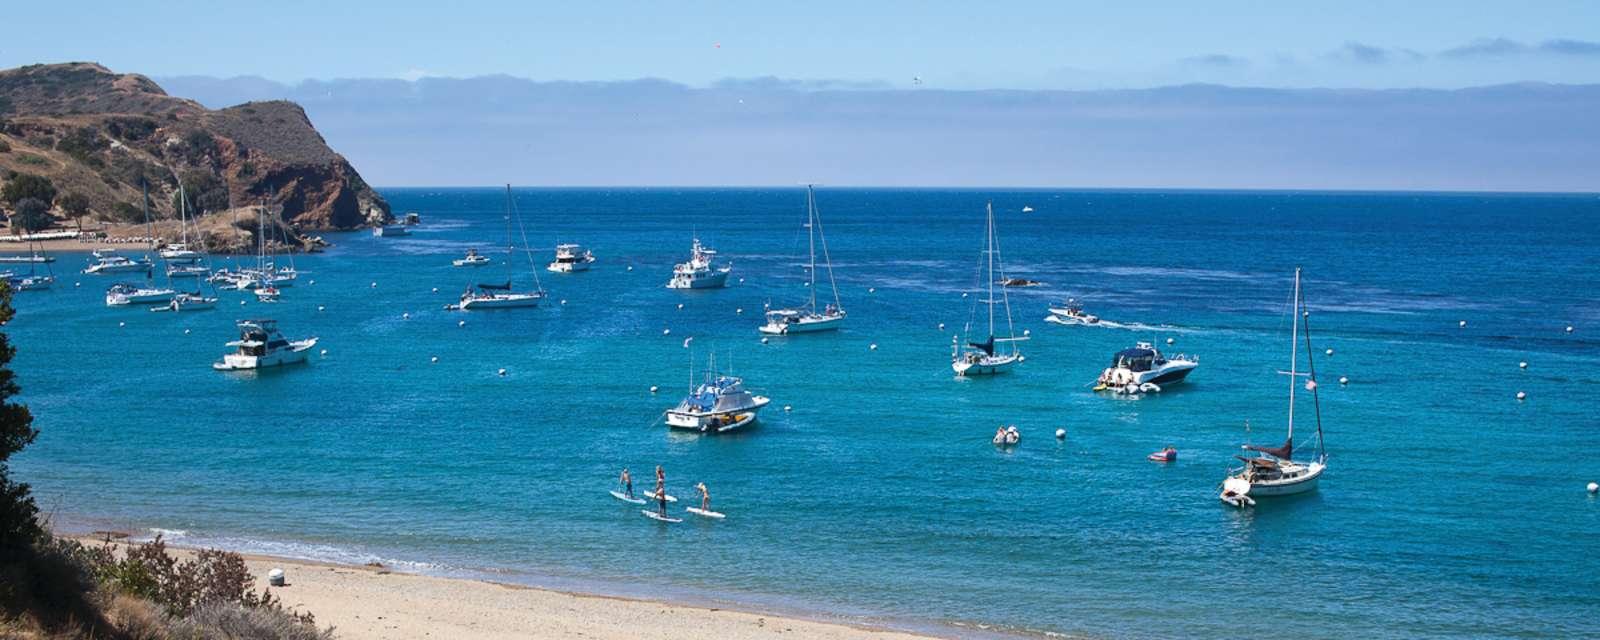 Catalina Island Mooring Info & Rules | Visit Catalina Island